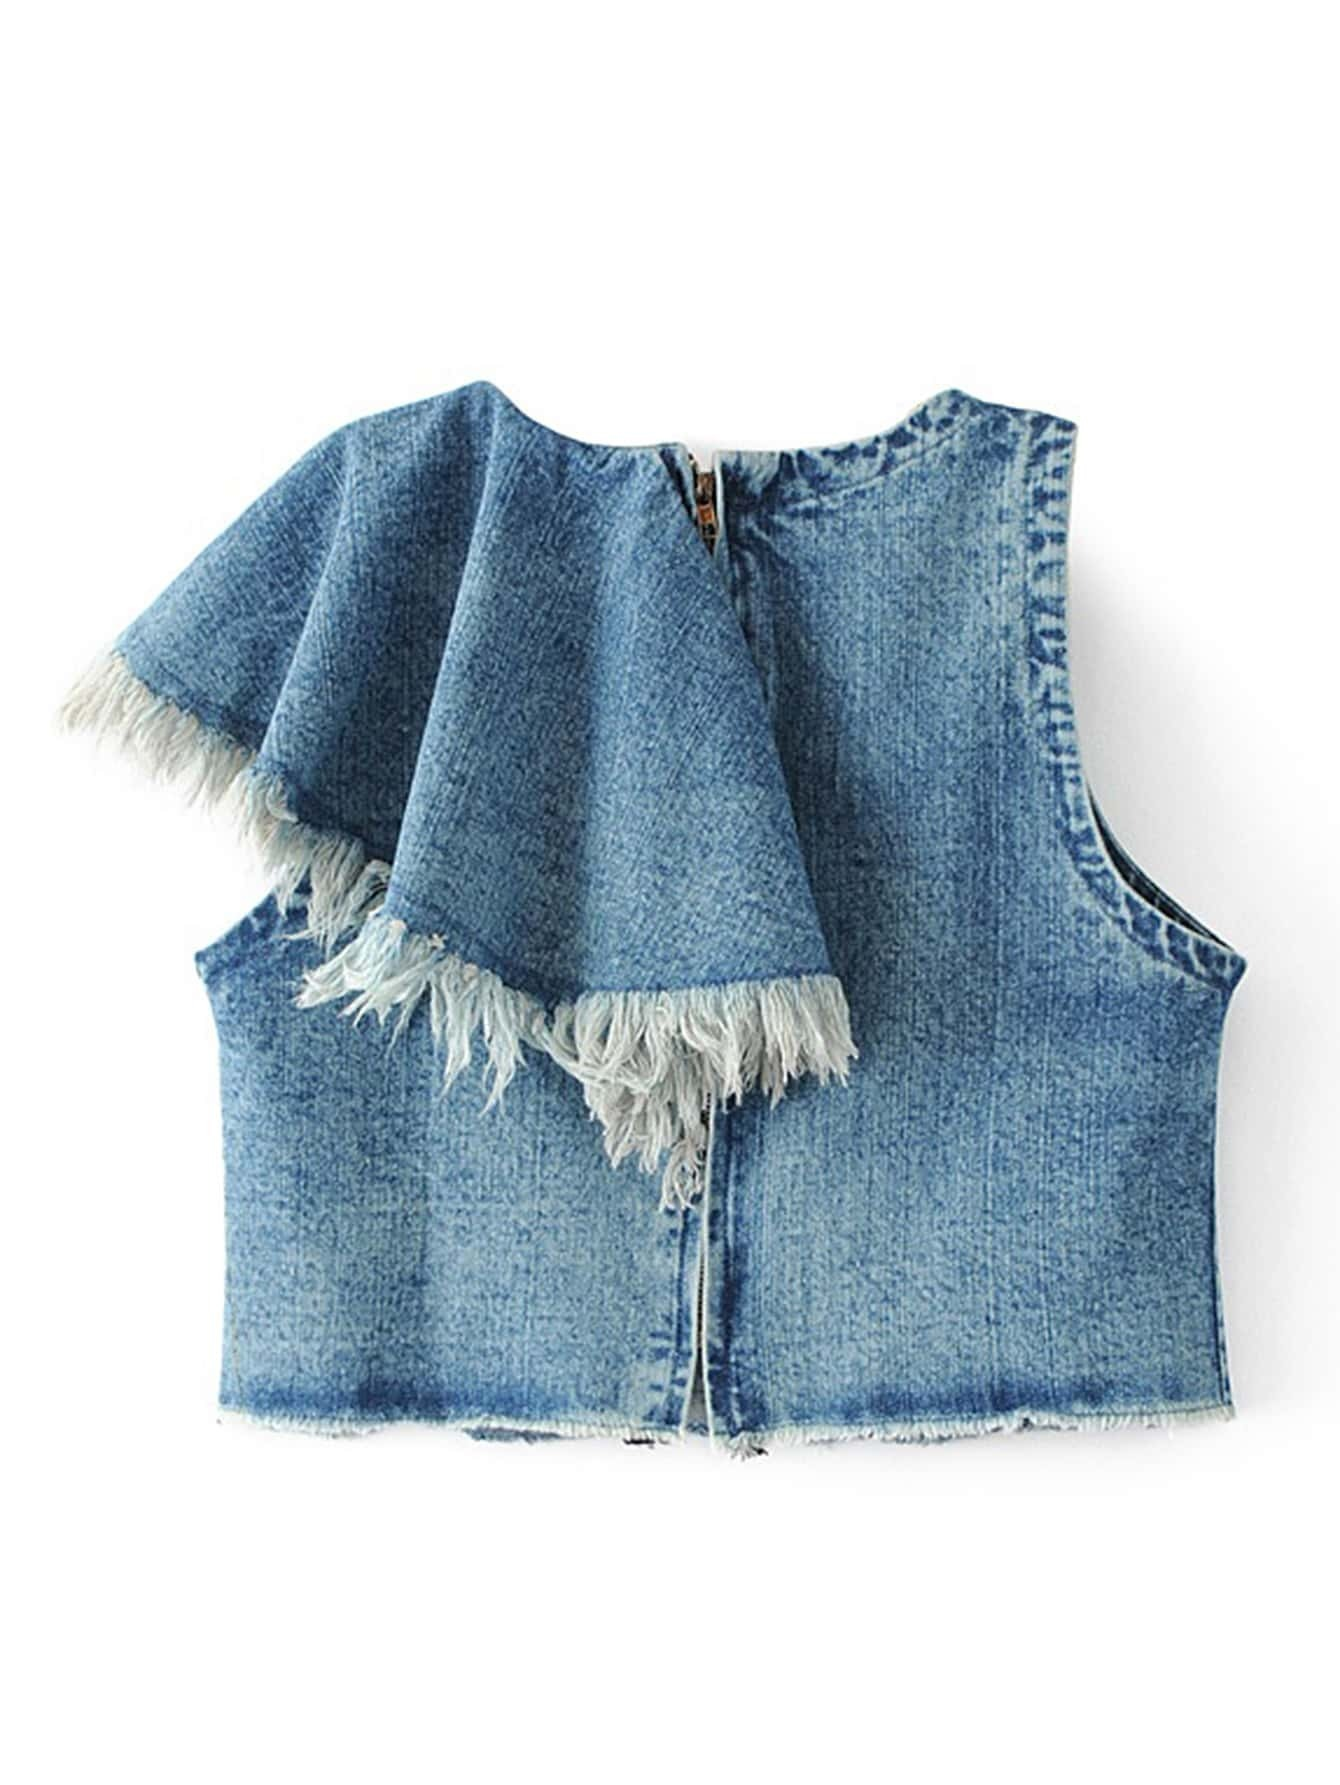 blouse170427202_2